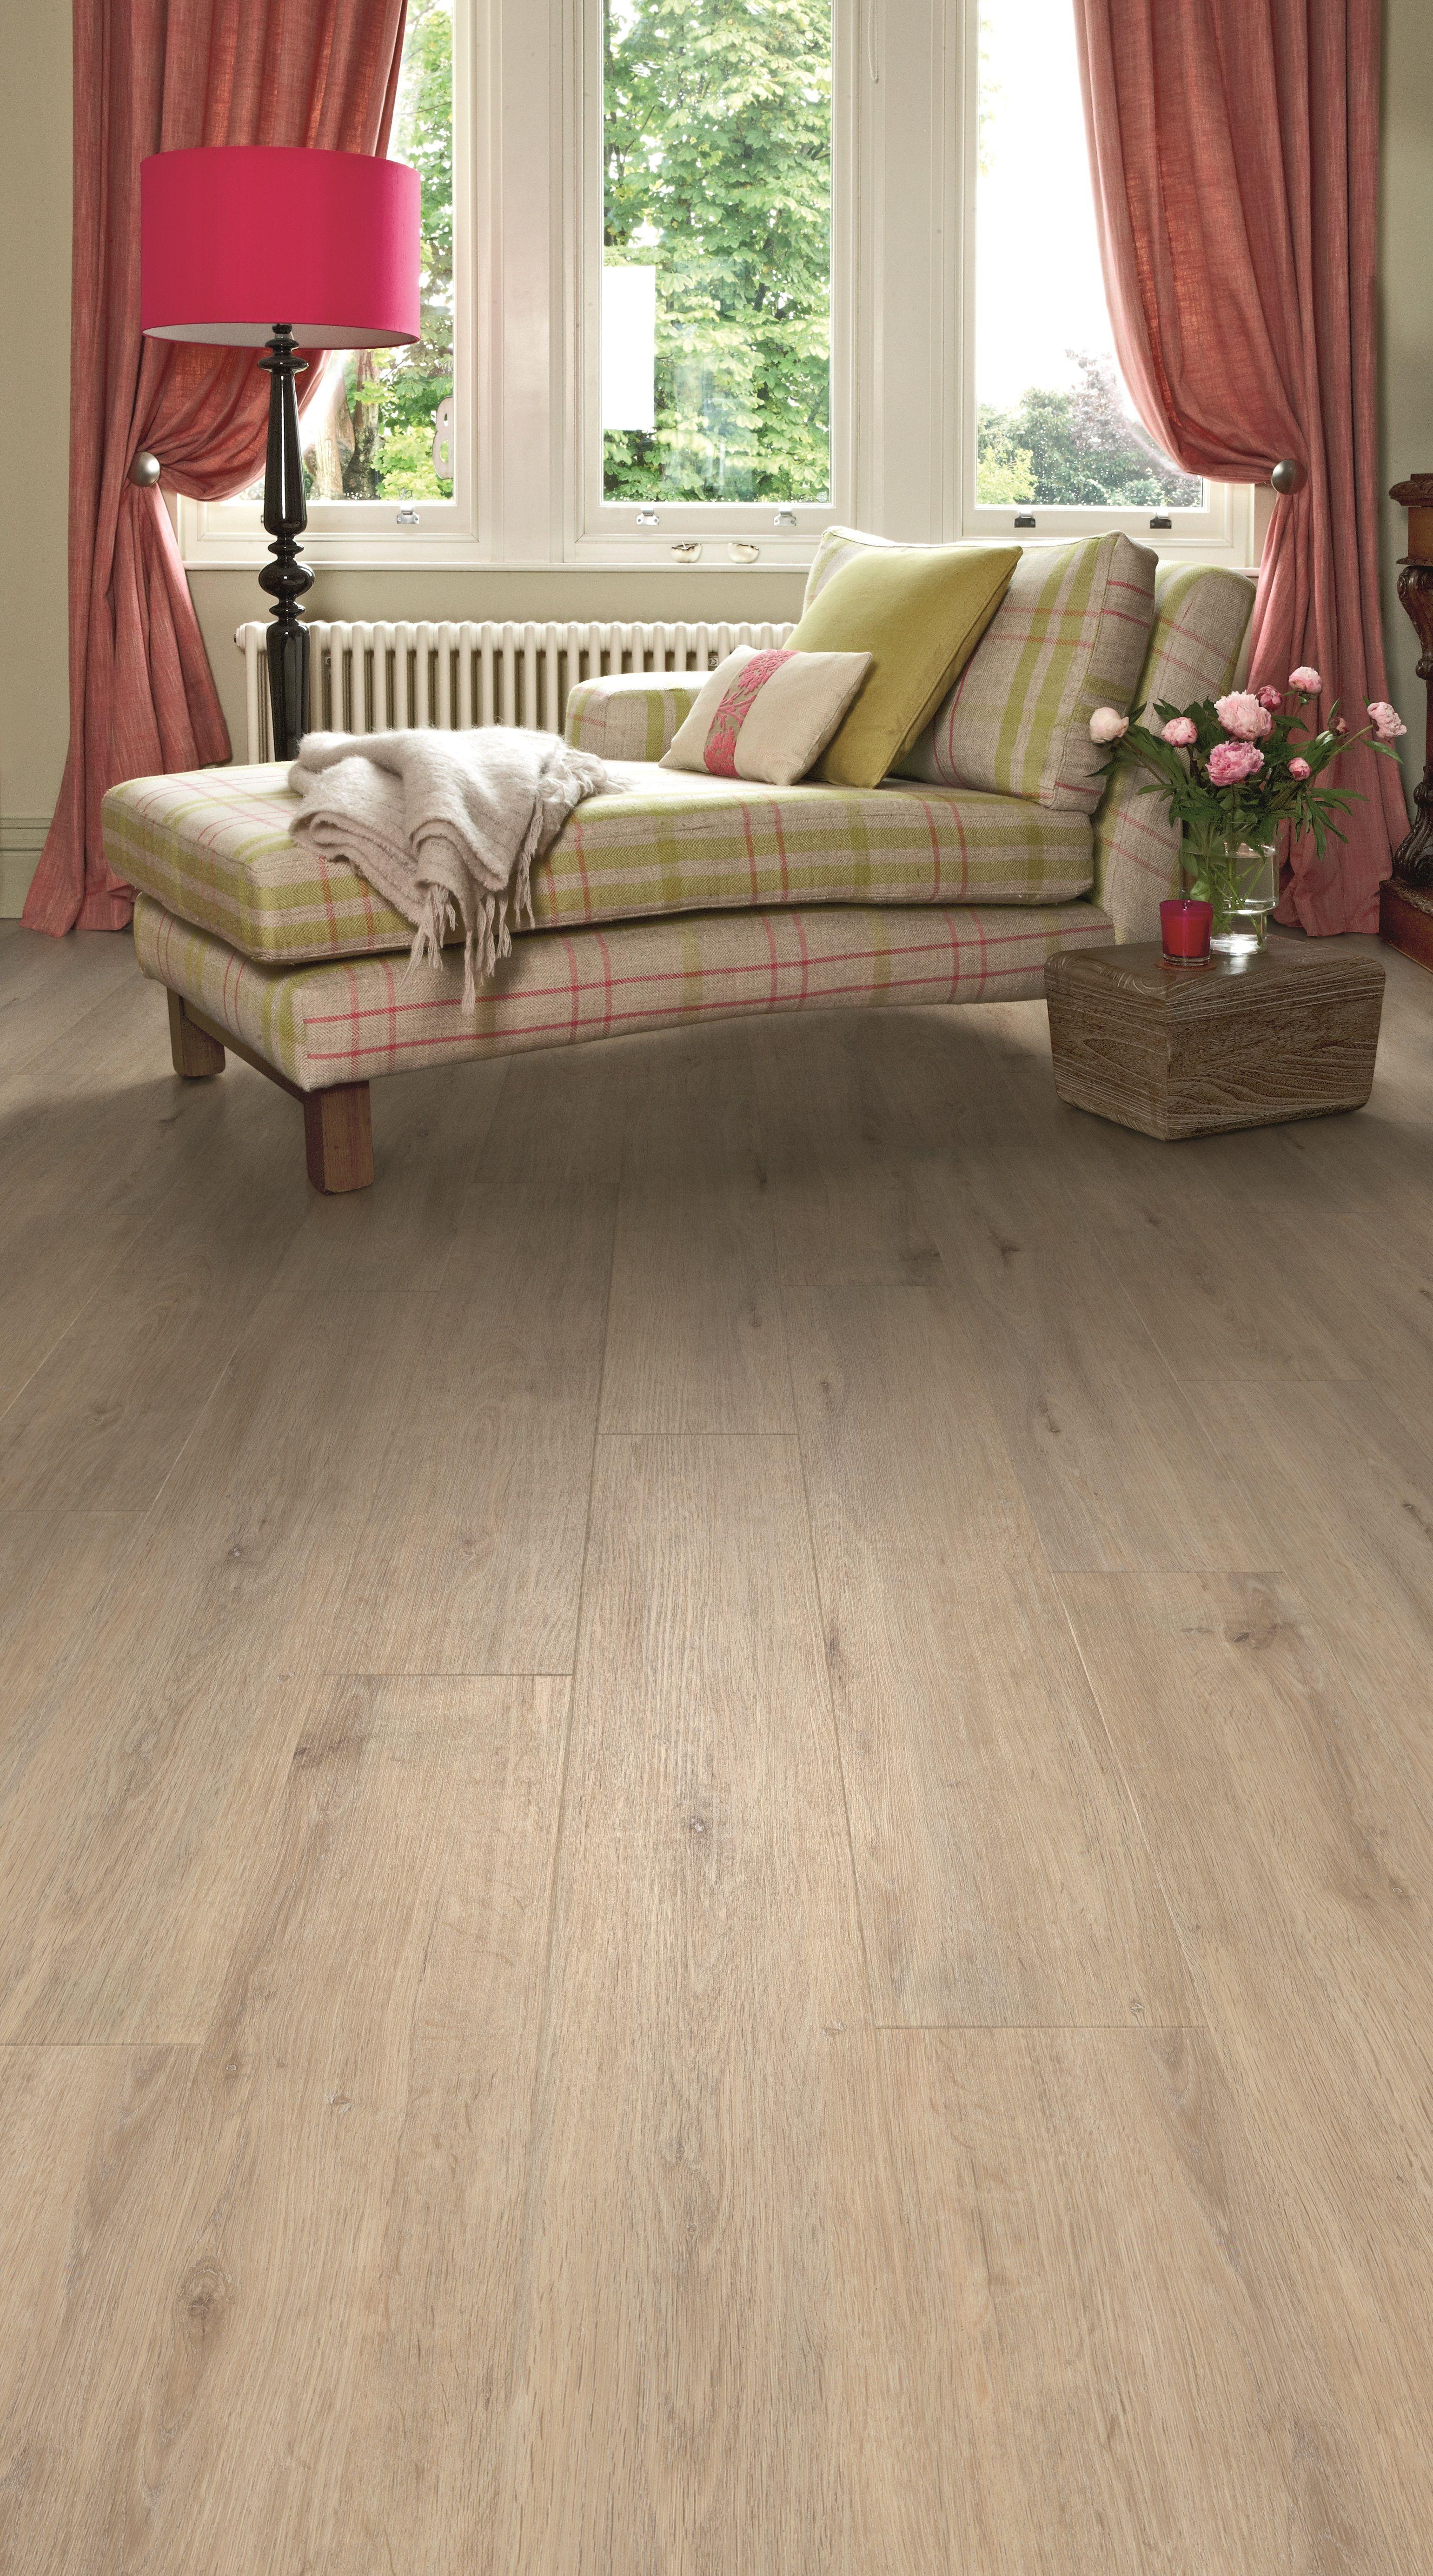 Fusion Flooring 1061 Country Elm Beautiful Living E Vinyl Tileswide Plankwood Grainluxury